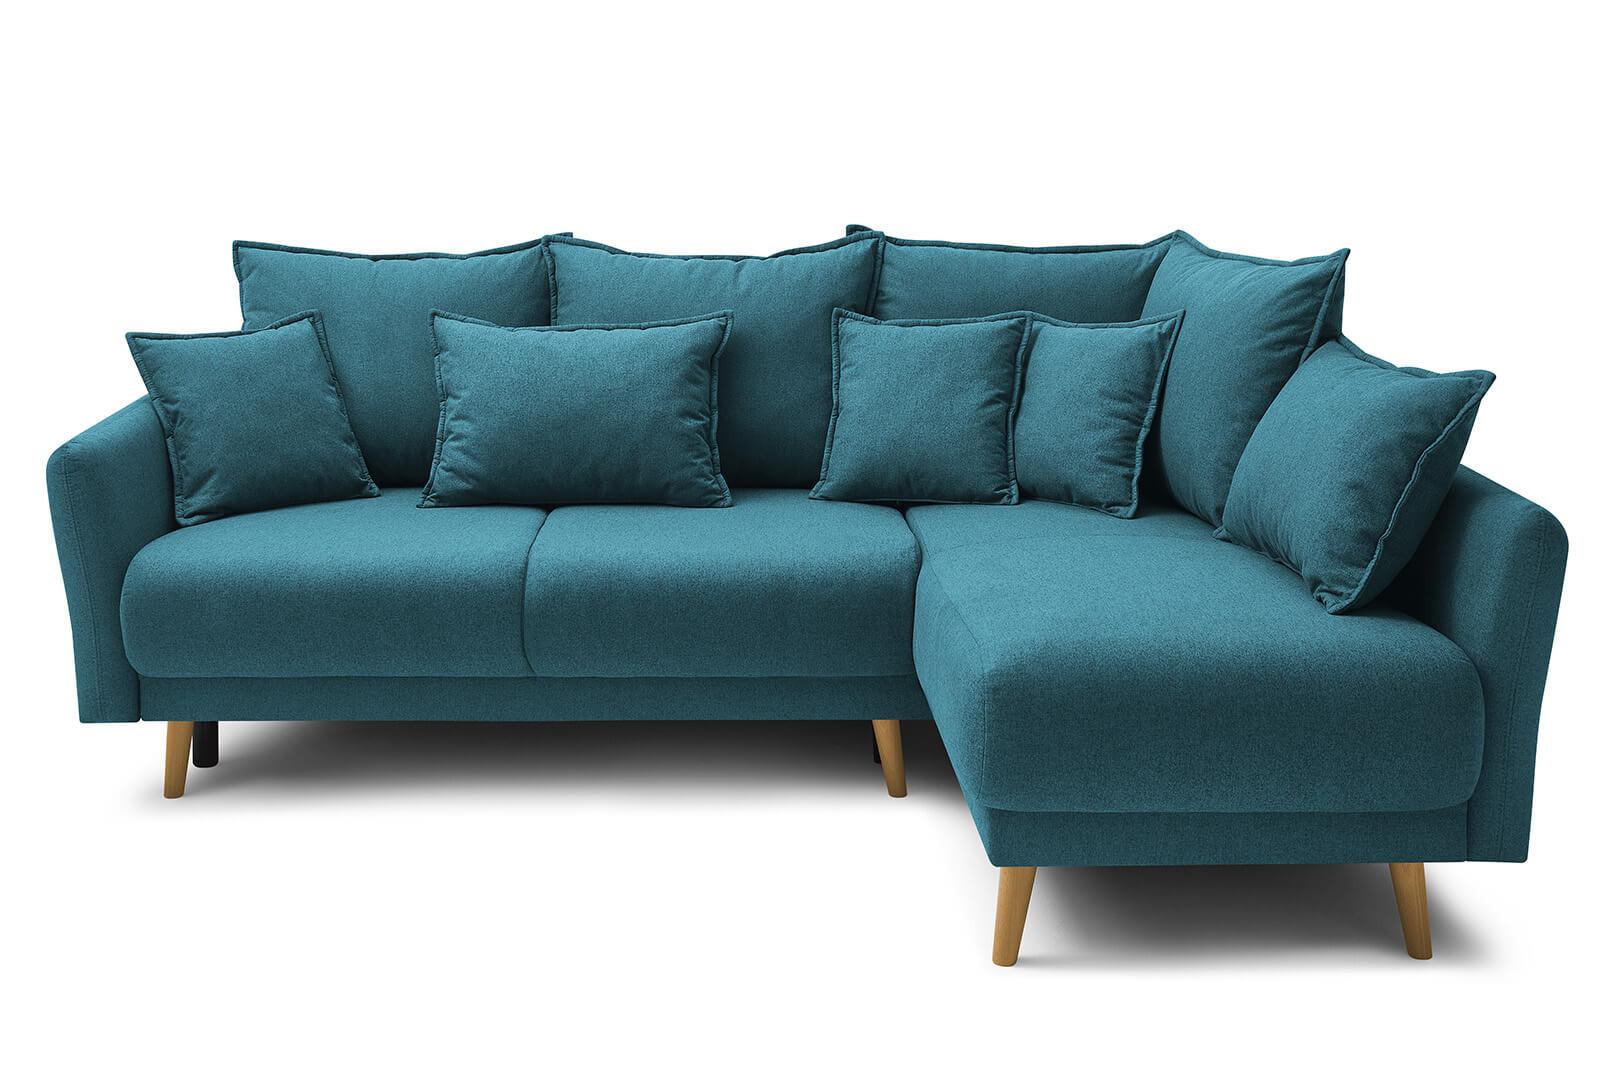 Canapé d'angle droit convertible 4 places Tissu Bleu canard